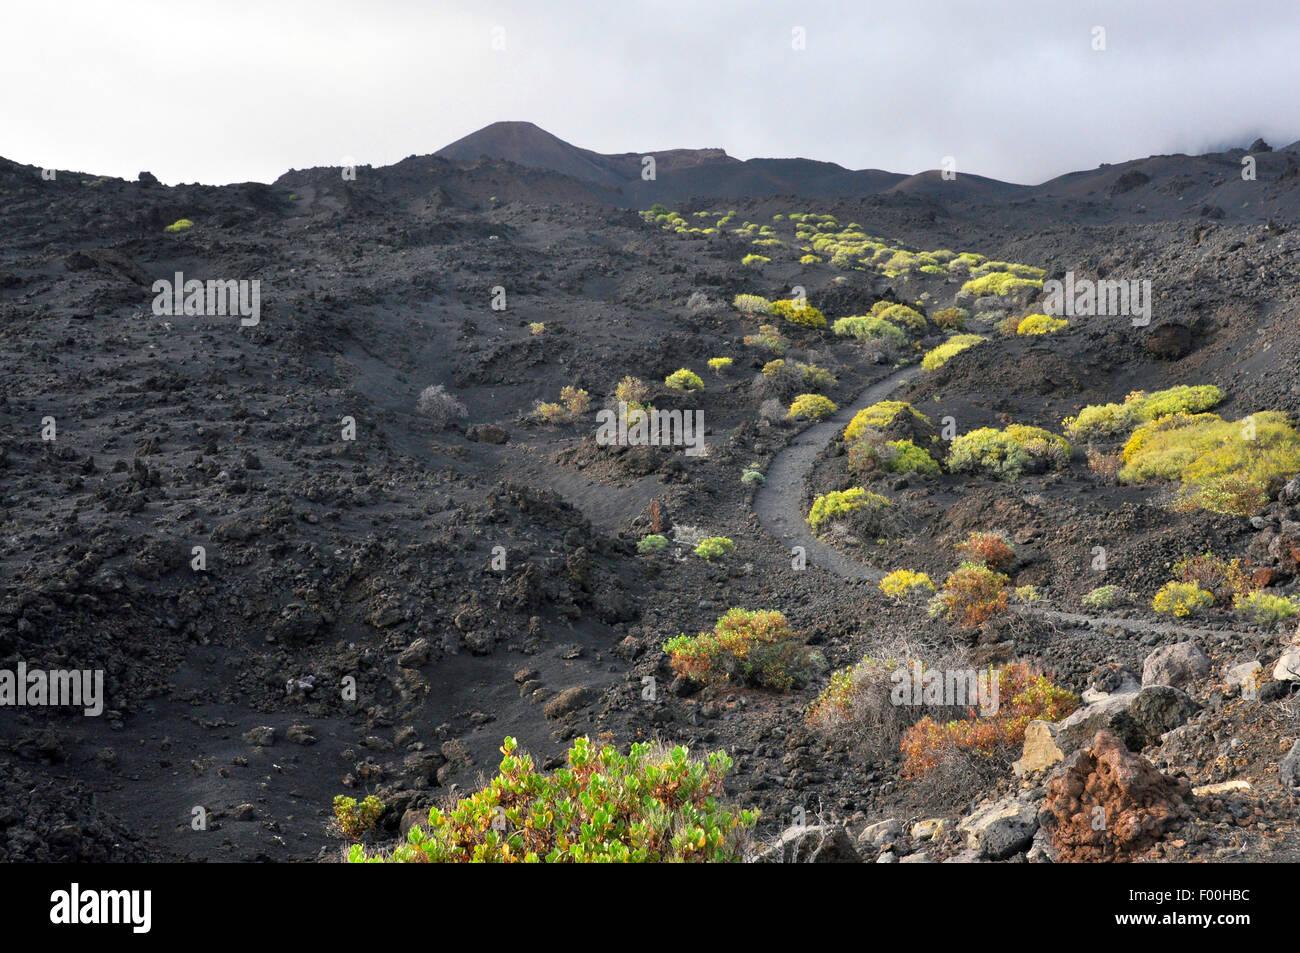 San Antonio Volcano, Kanarische Inseln, La Palma FuencalienteStockfoto